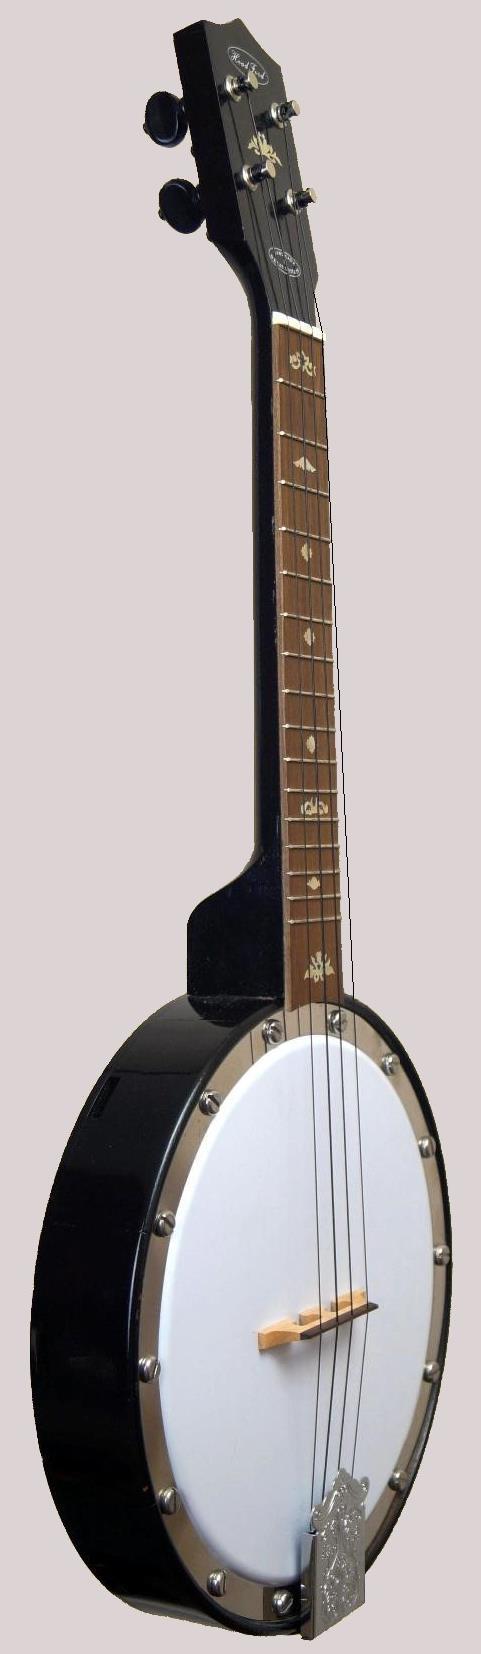 bob headford kent Banjo at Ukulele Corner